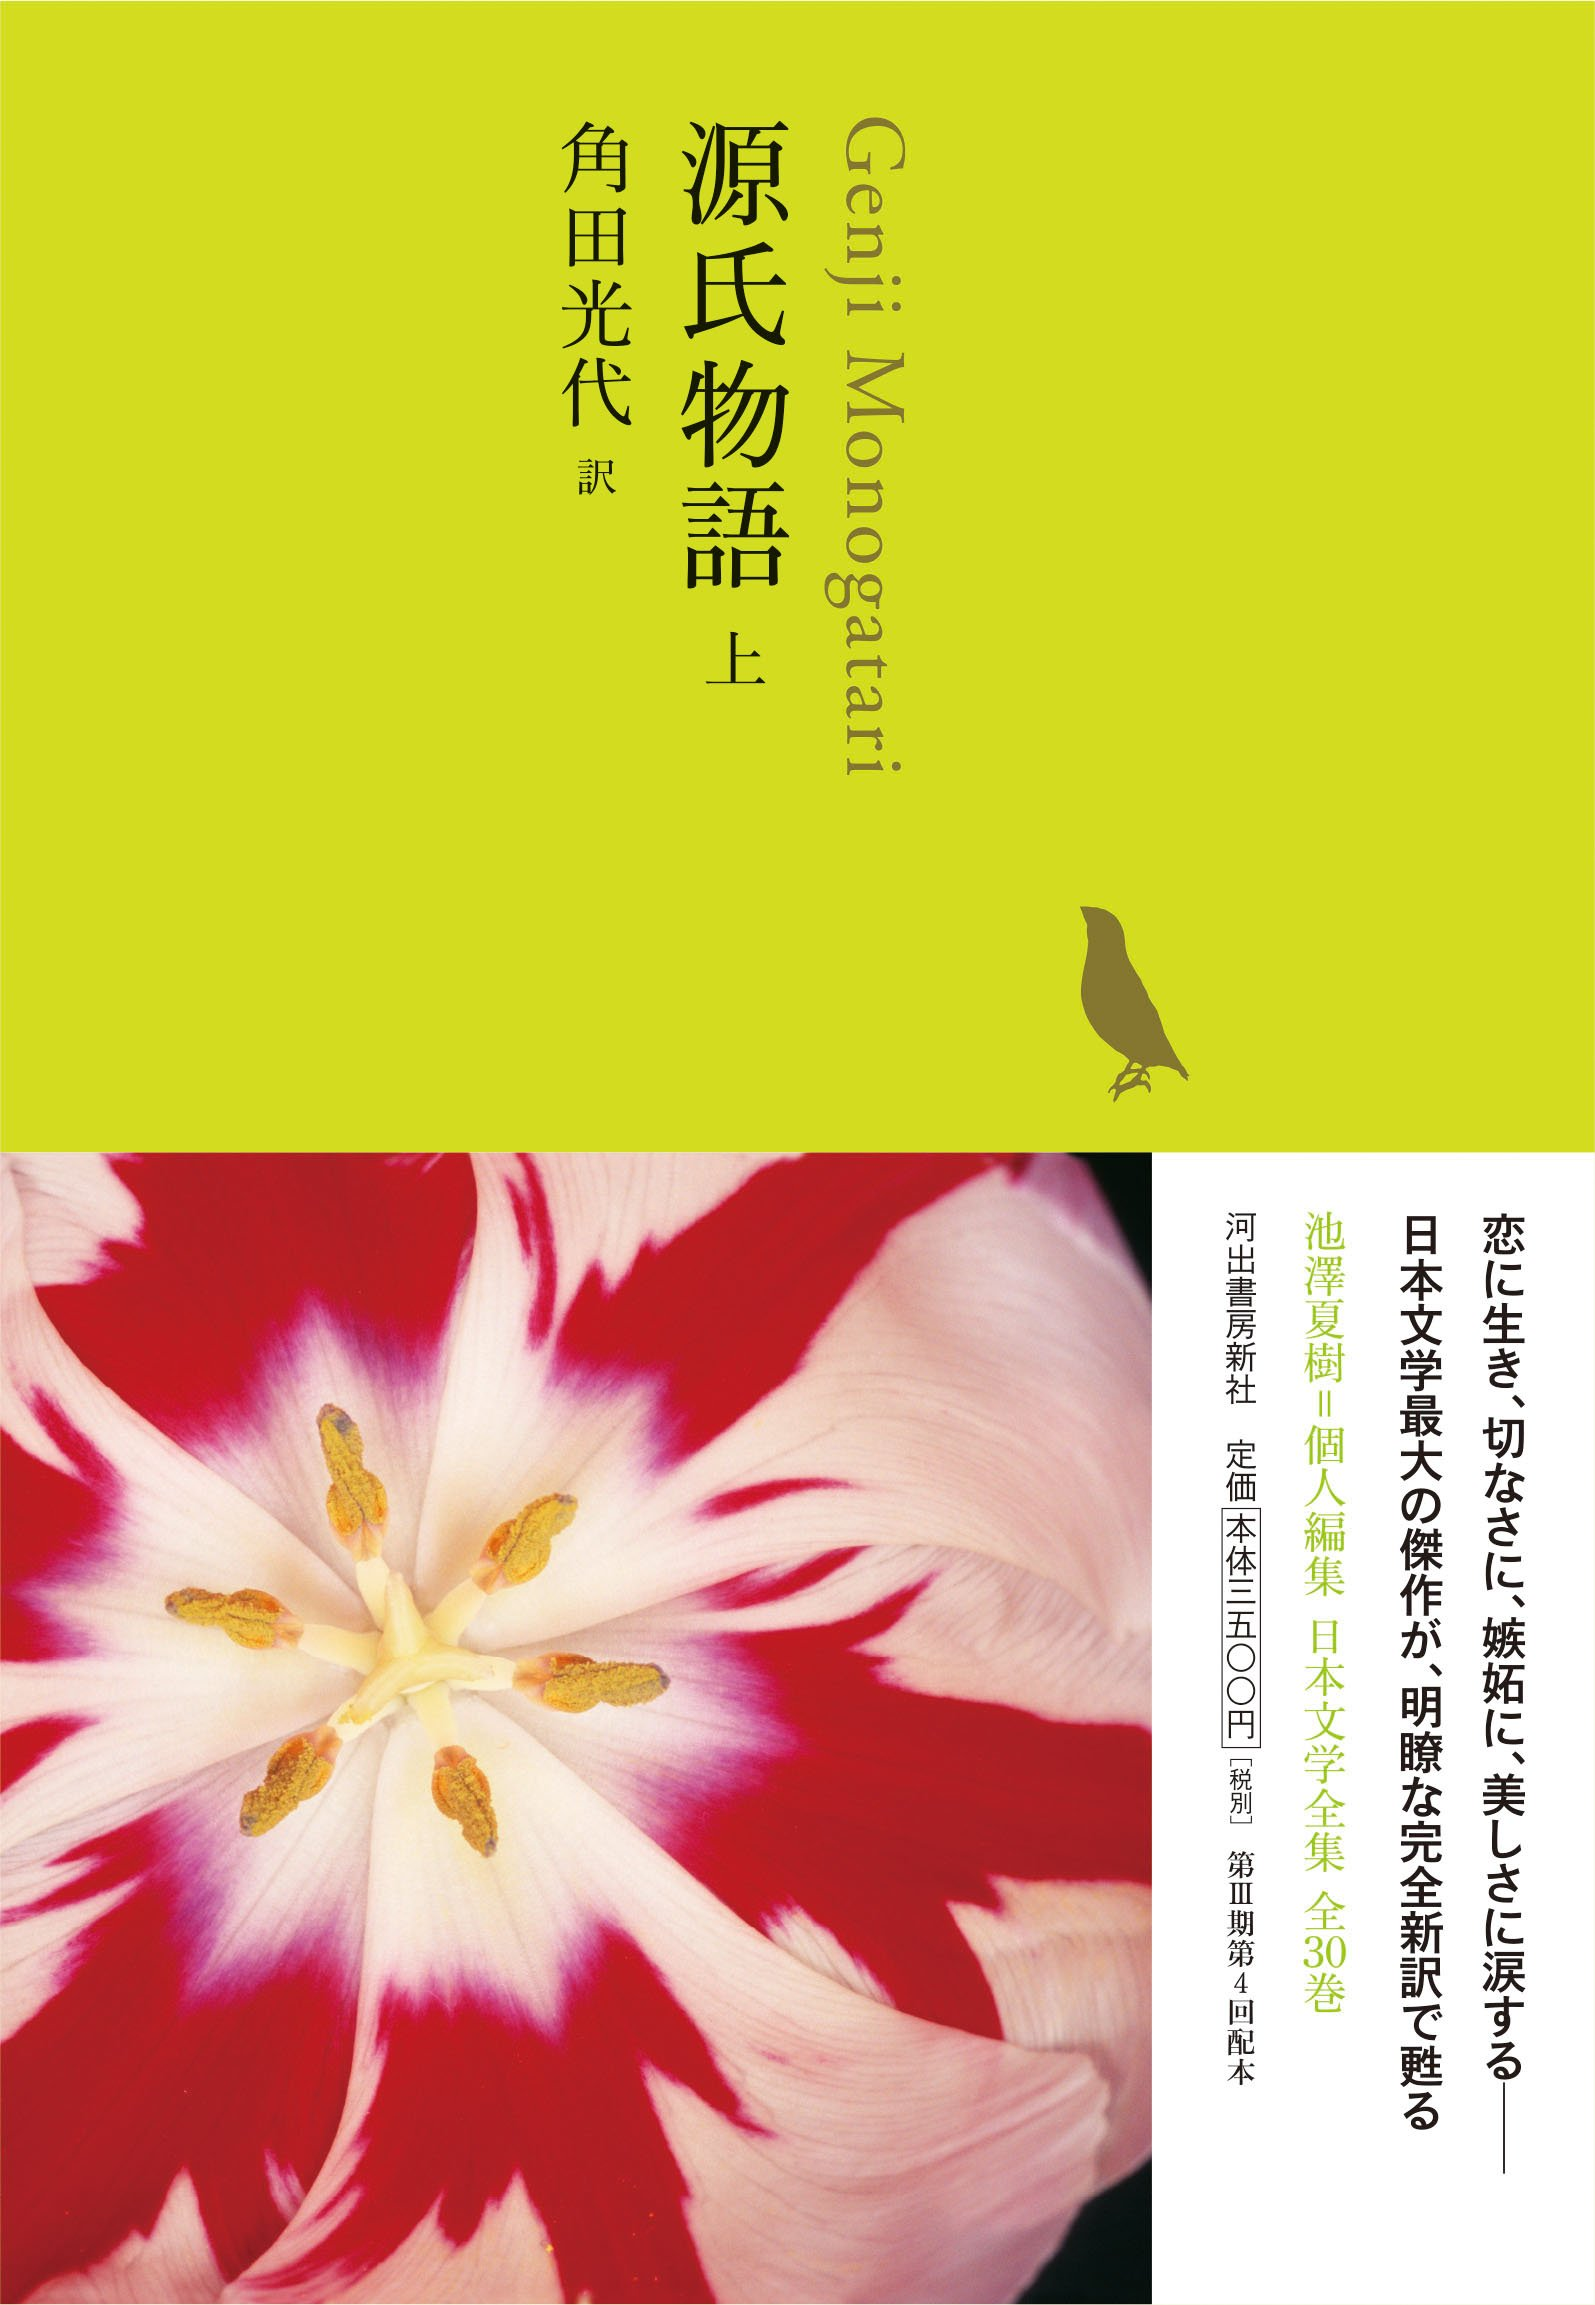 須磨の秋現代語訳